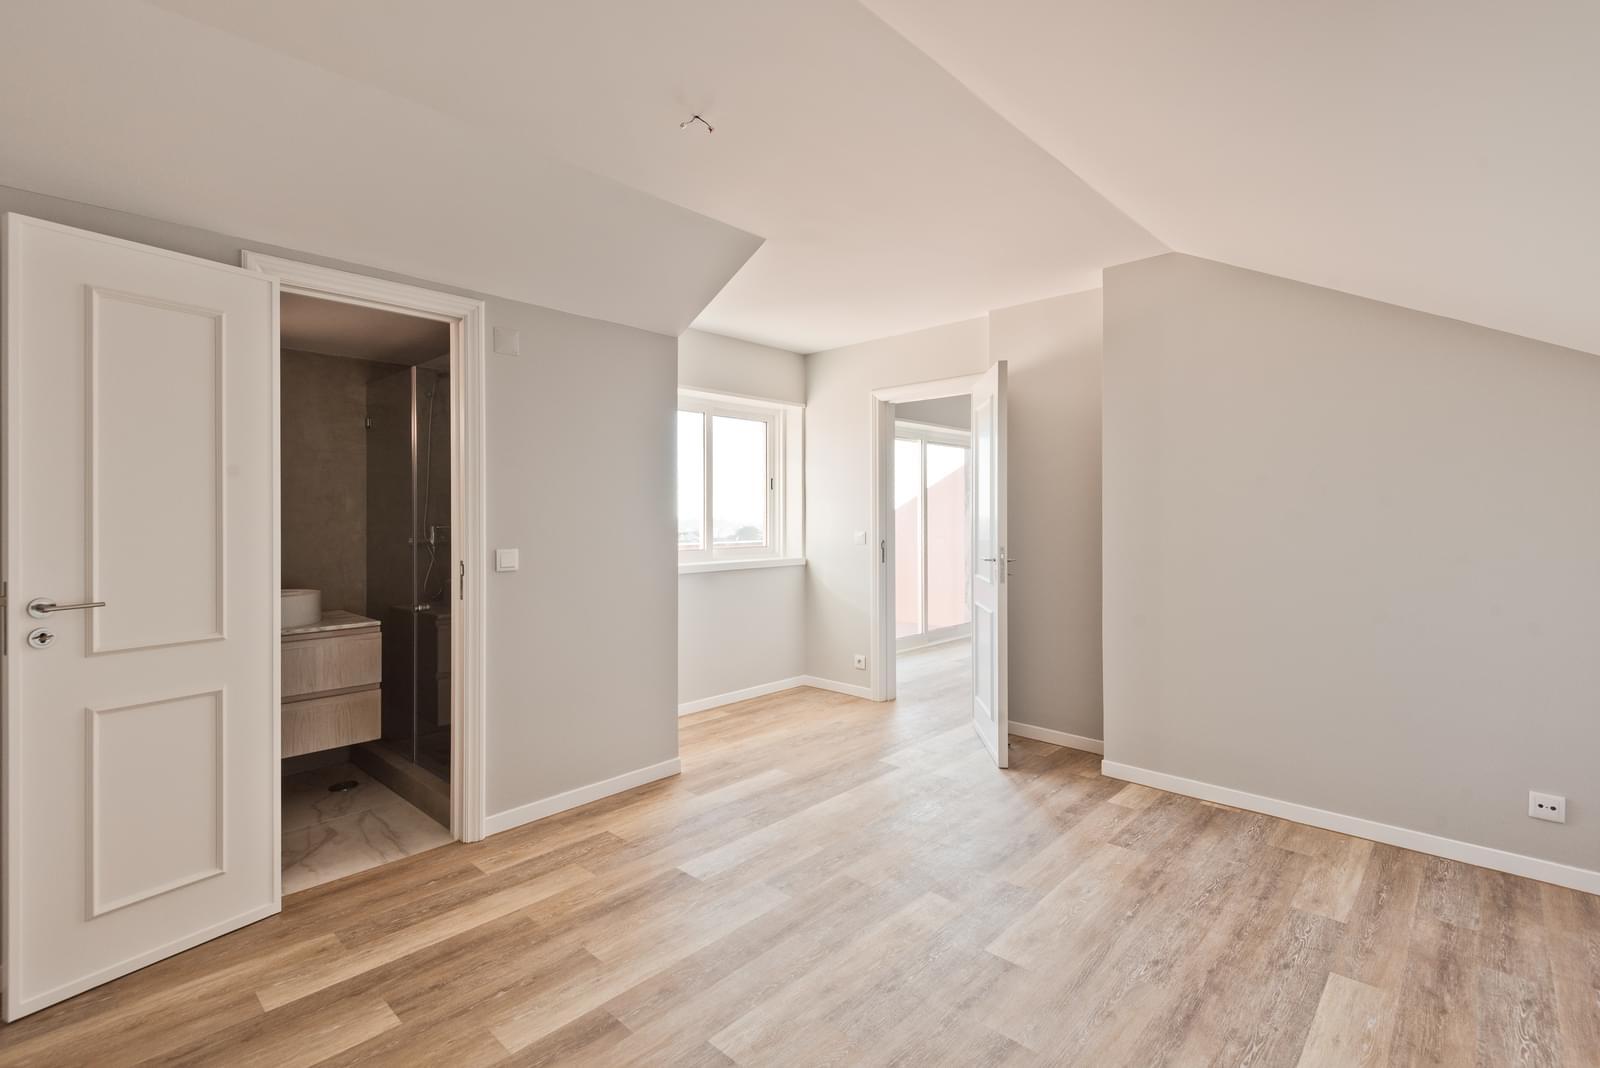 pf18956-apartamento-t3-1-cascais-d7e96ebd-bf5e-447d-89f4-10a54d7f003a